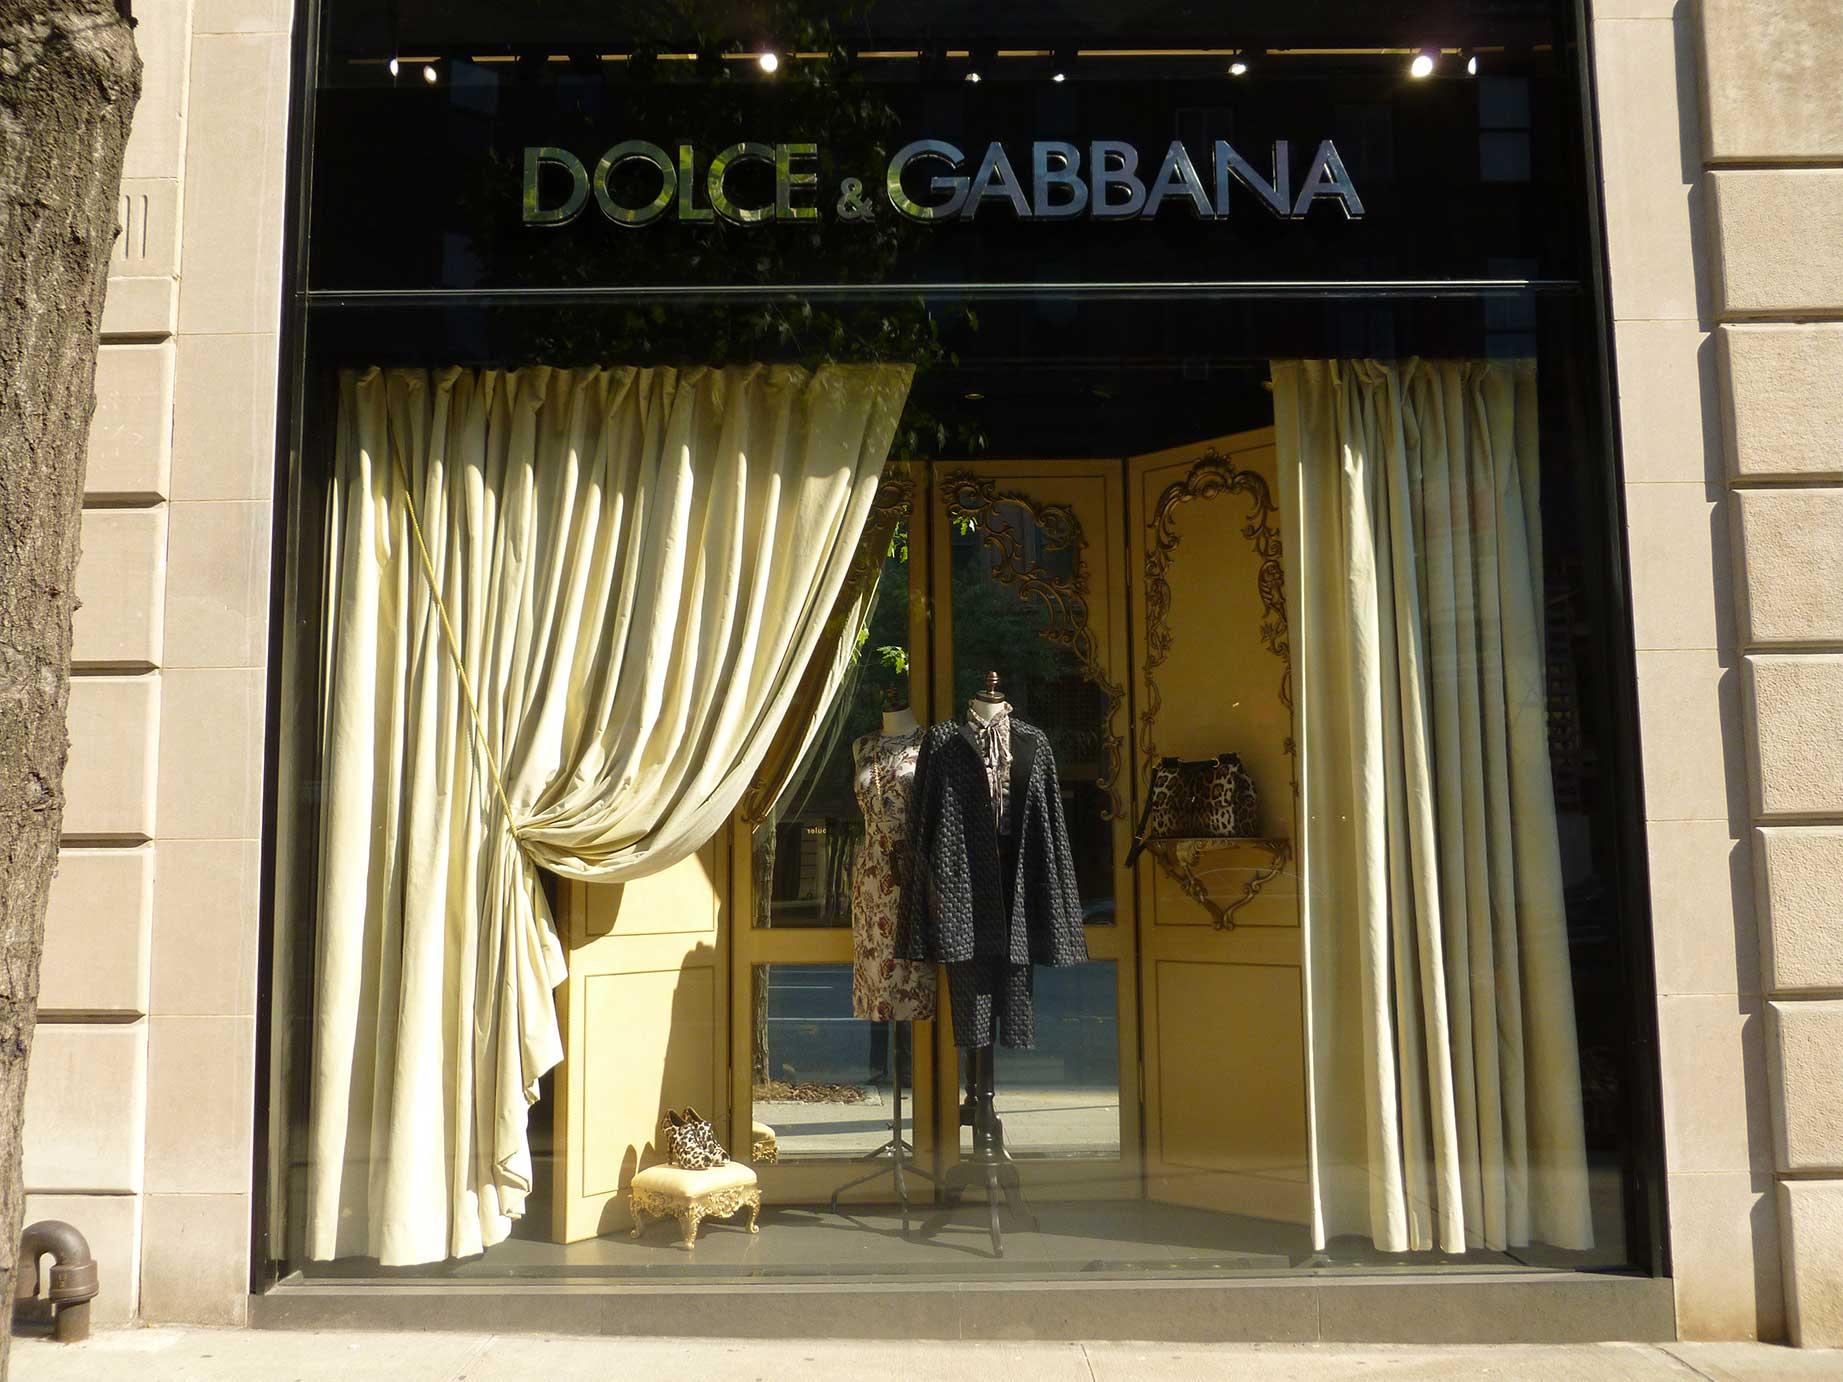 custom-drape-dolce-gabbana-nyc-window-display-9-13-12